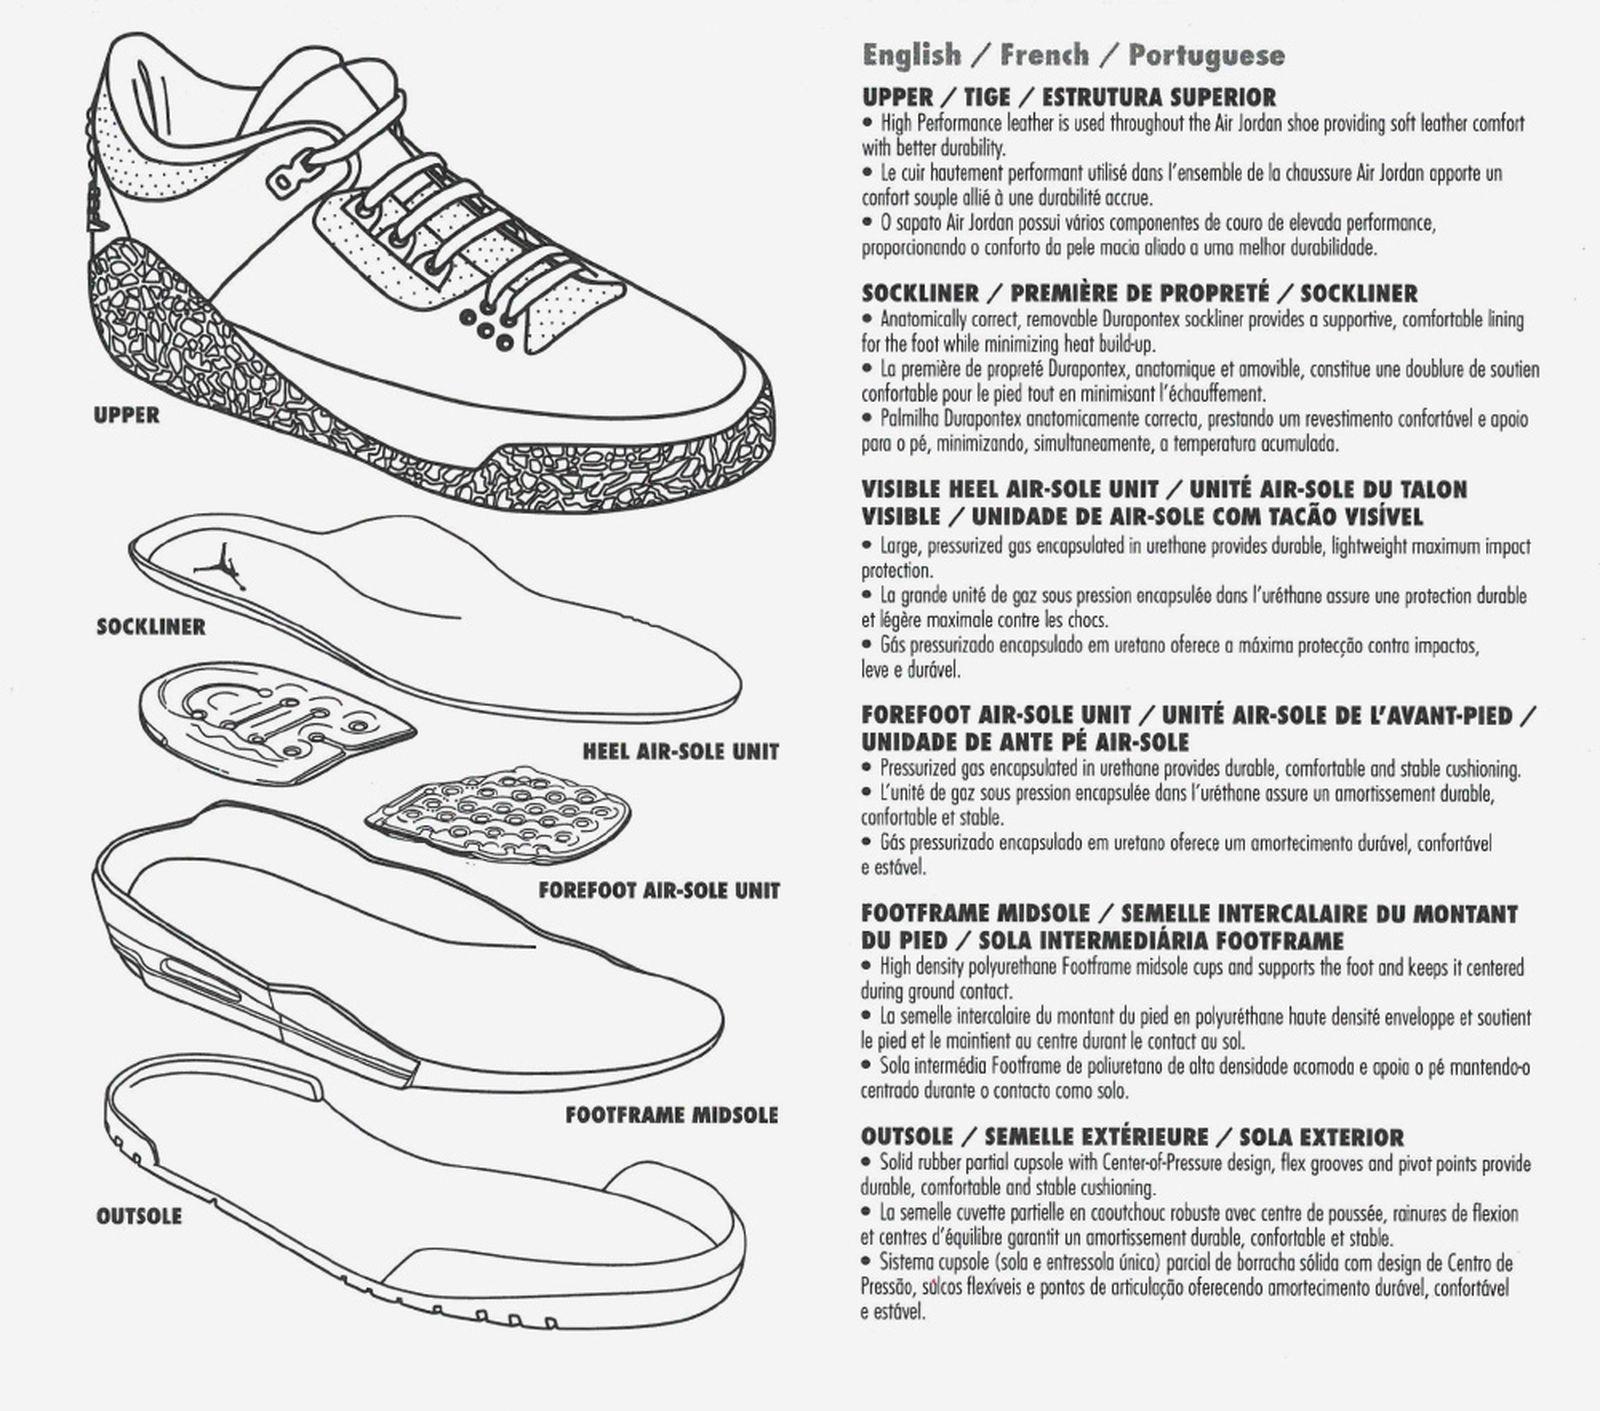 selling sneakers online guide Nike michael jordan